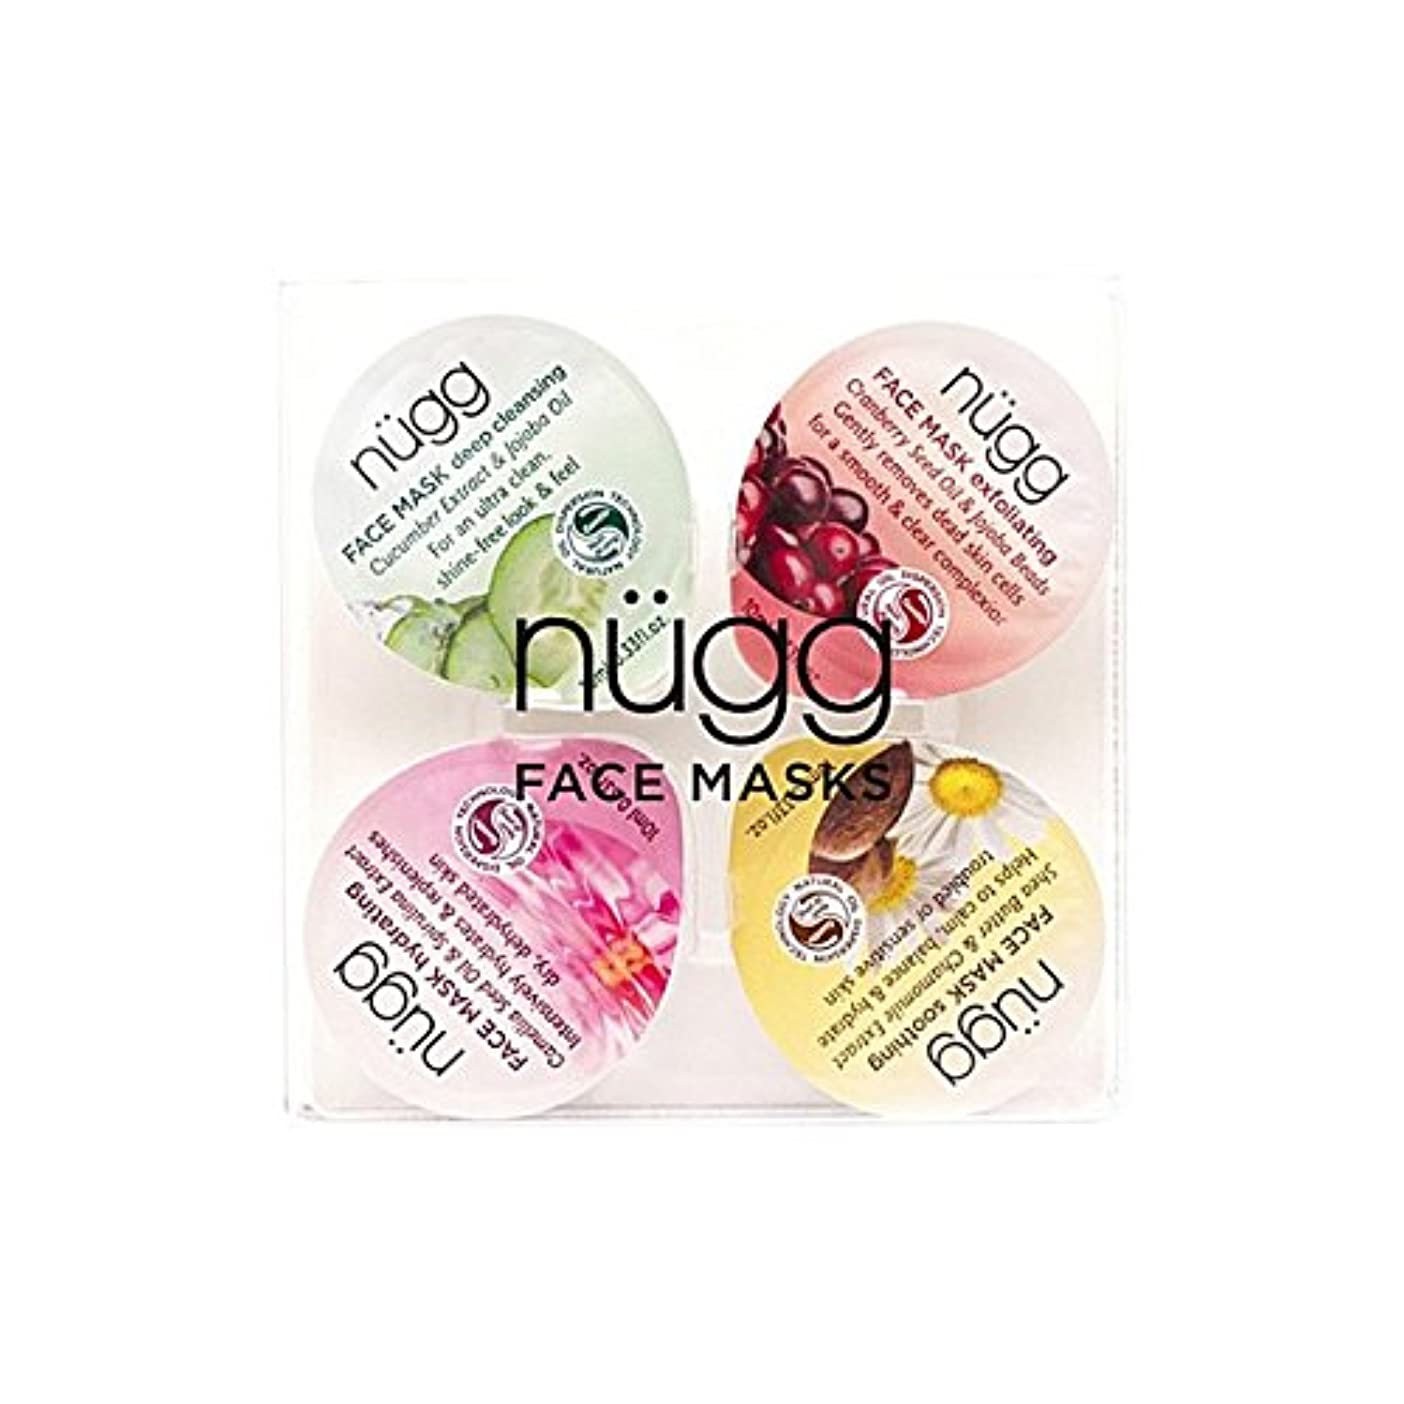 Nugg Face Mask Set (Pack of 6) - フェイスマスクセット x6 [並行輸入品]